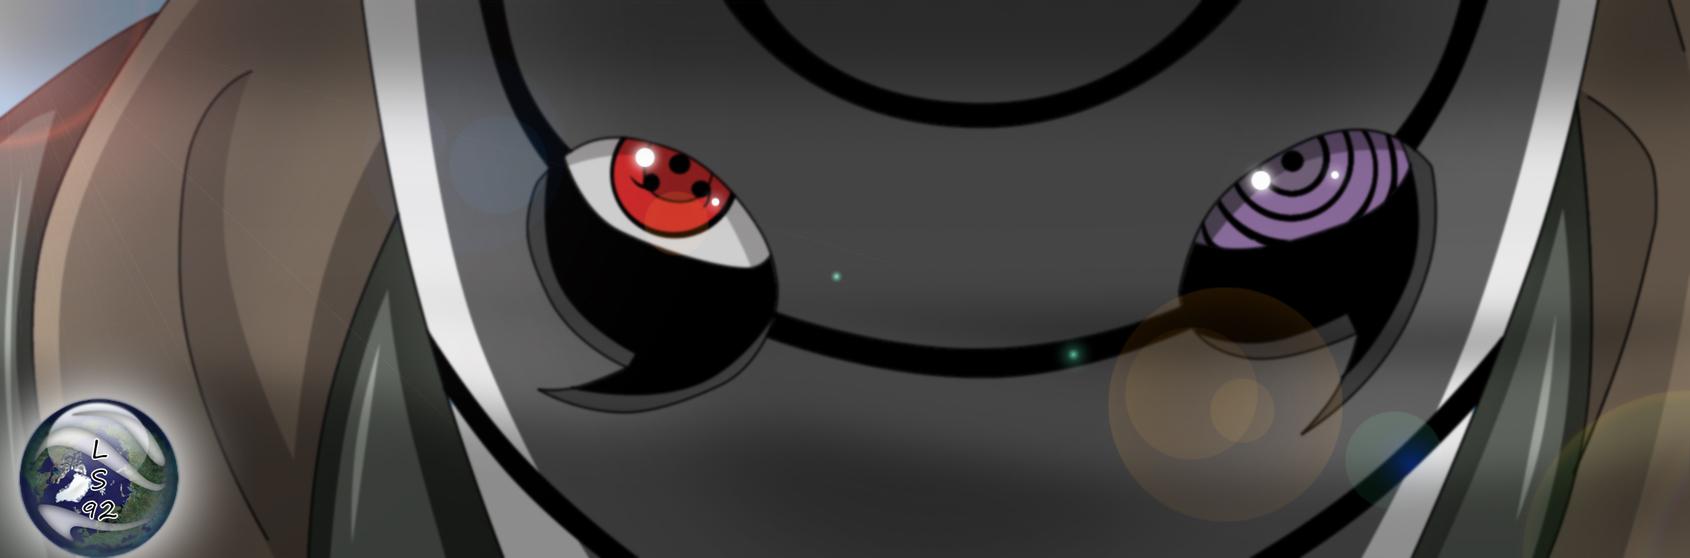 Tobi - Naruto (With Rinnegan) Minecraft Skin